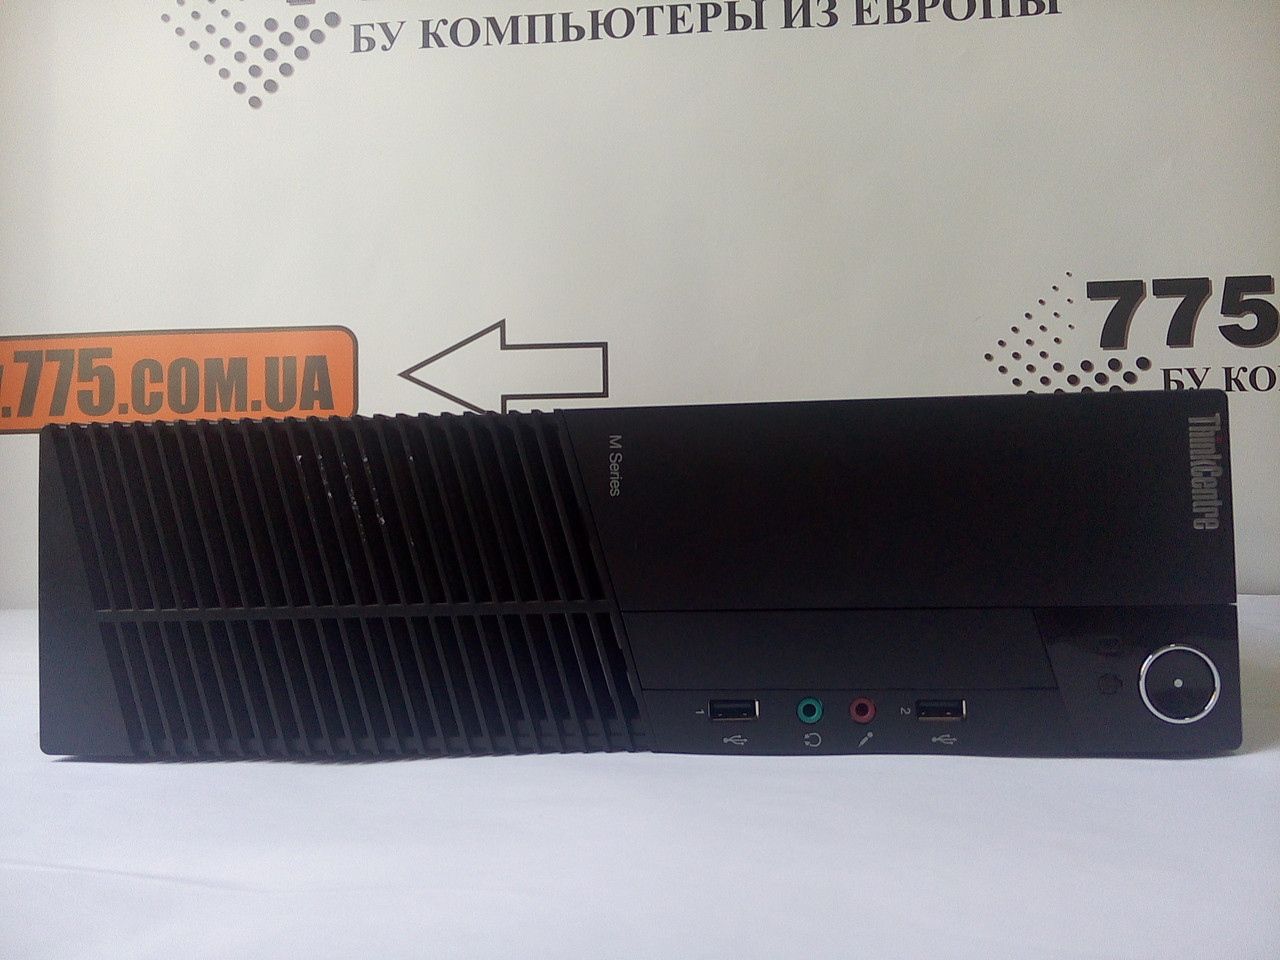 Компьютер Lenovo M71-M92 (Desktop), Intel Core i3-3220 3.3GHz, RAM 4ГБ, SSD 120ГБ